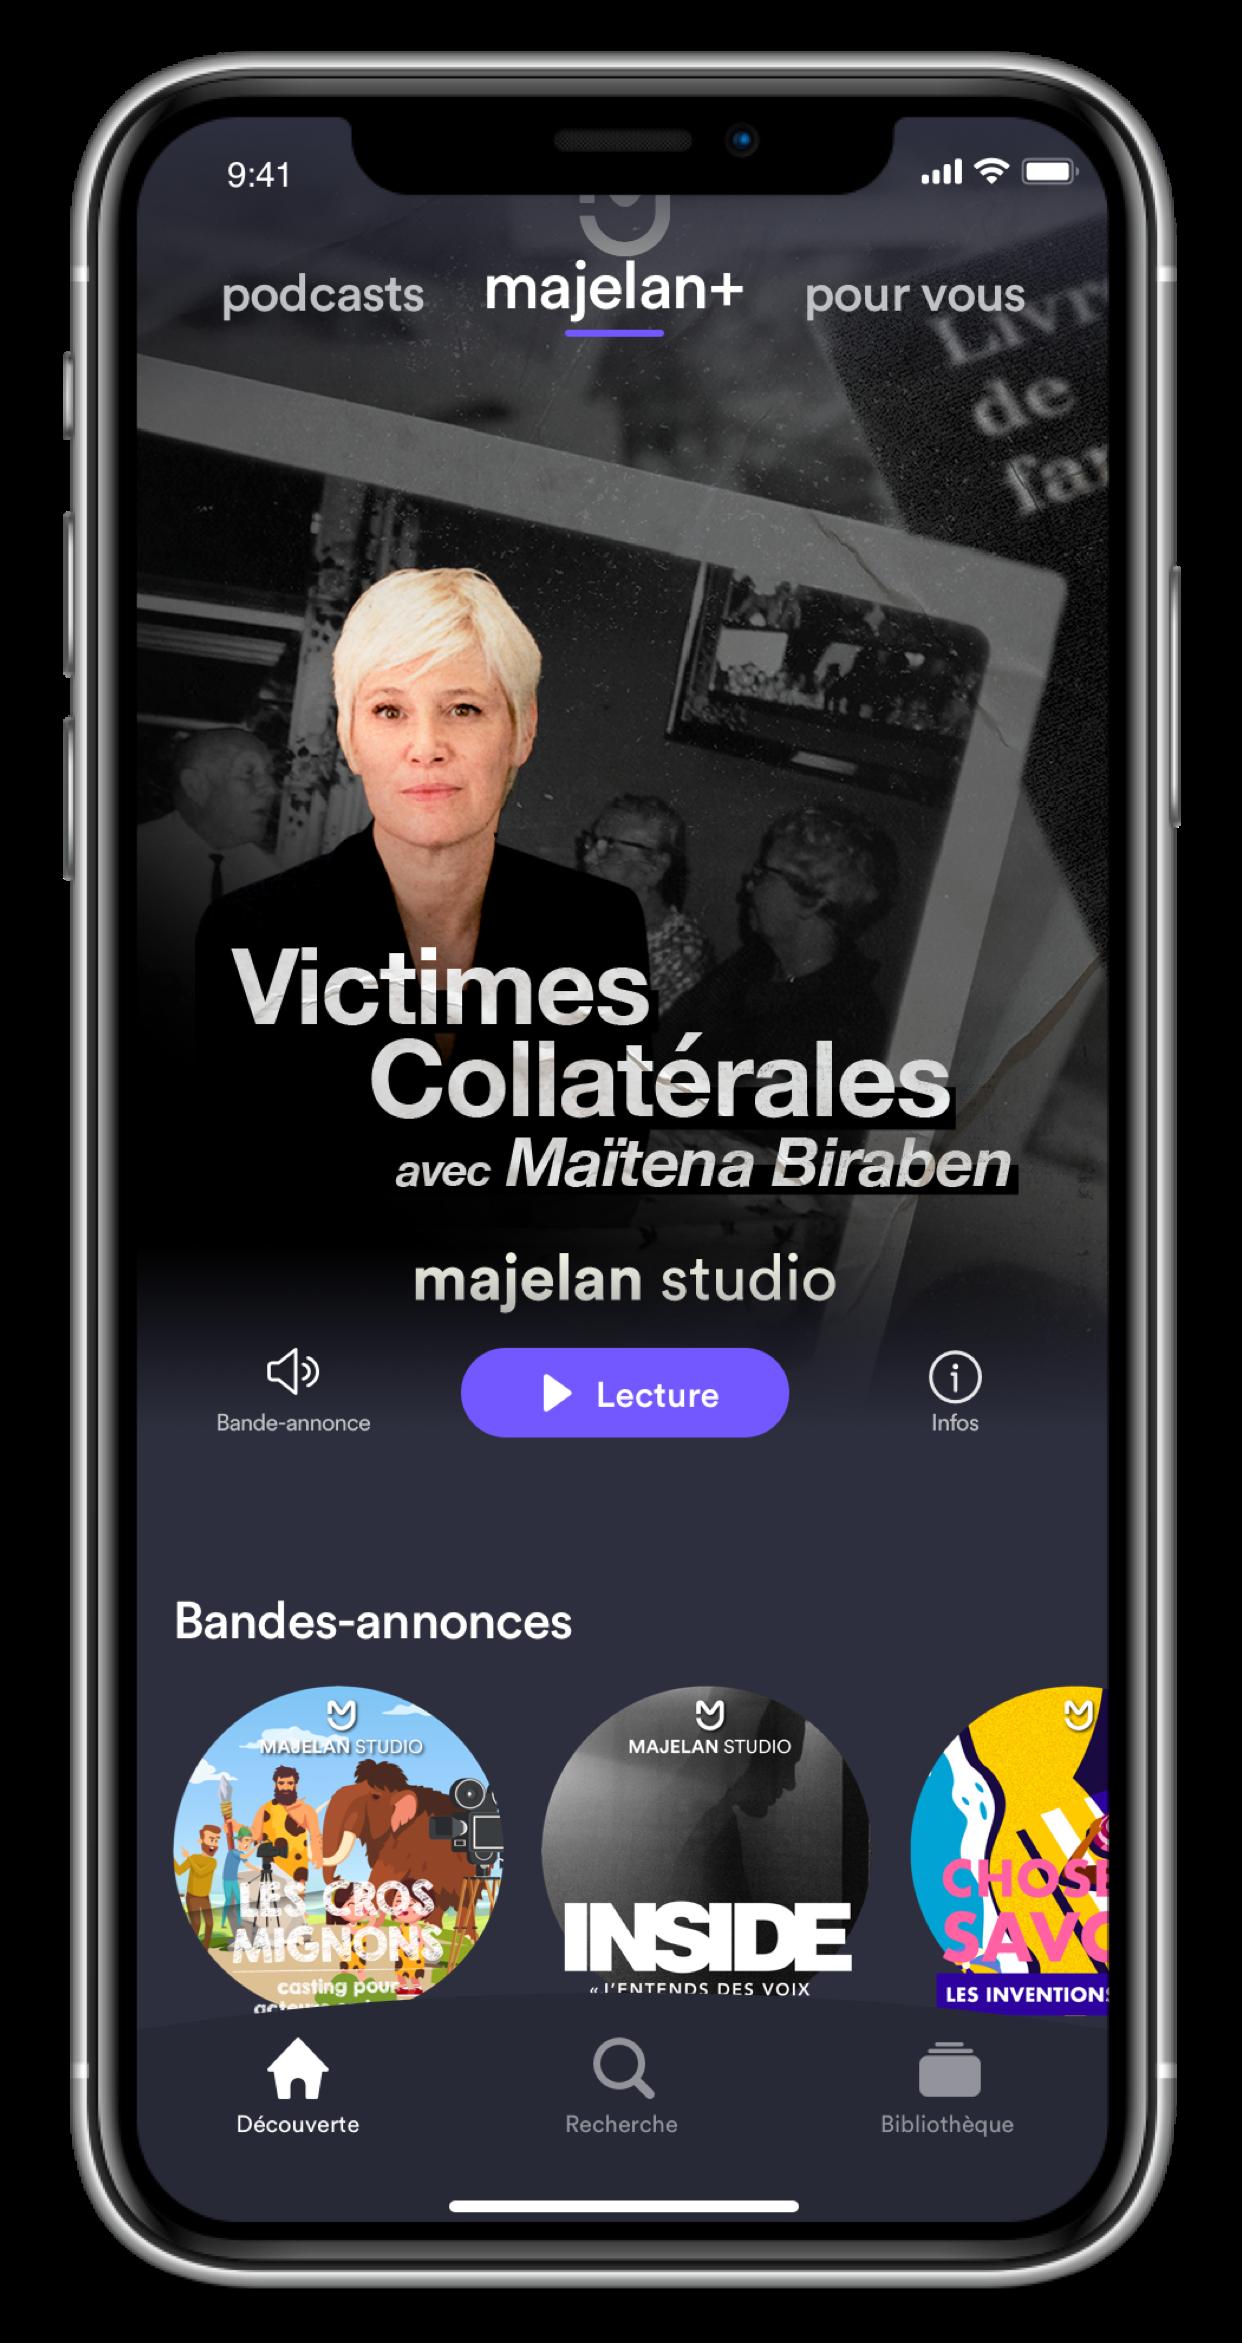 Majelan : un podcast avec Maïtena Biraben